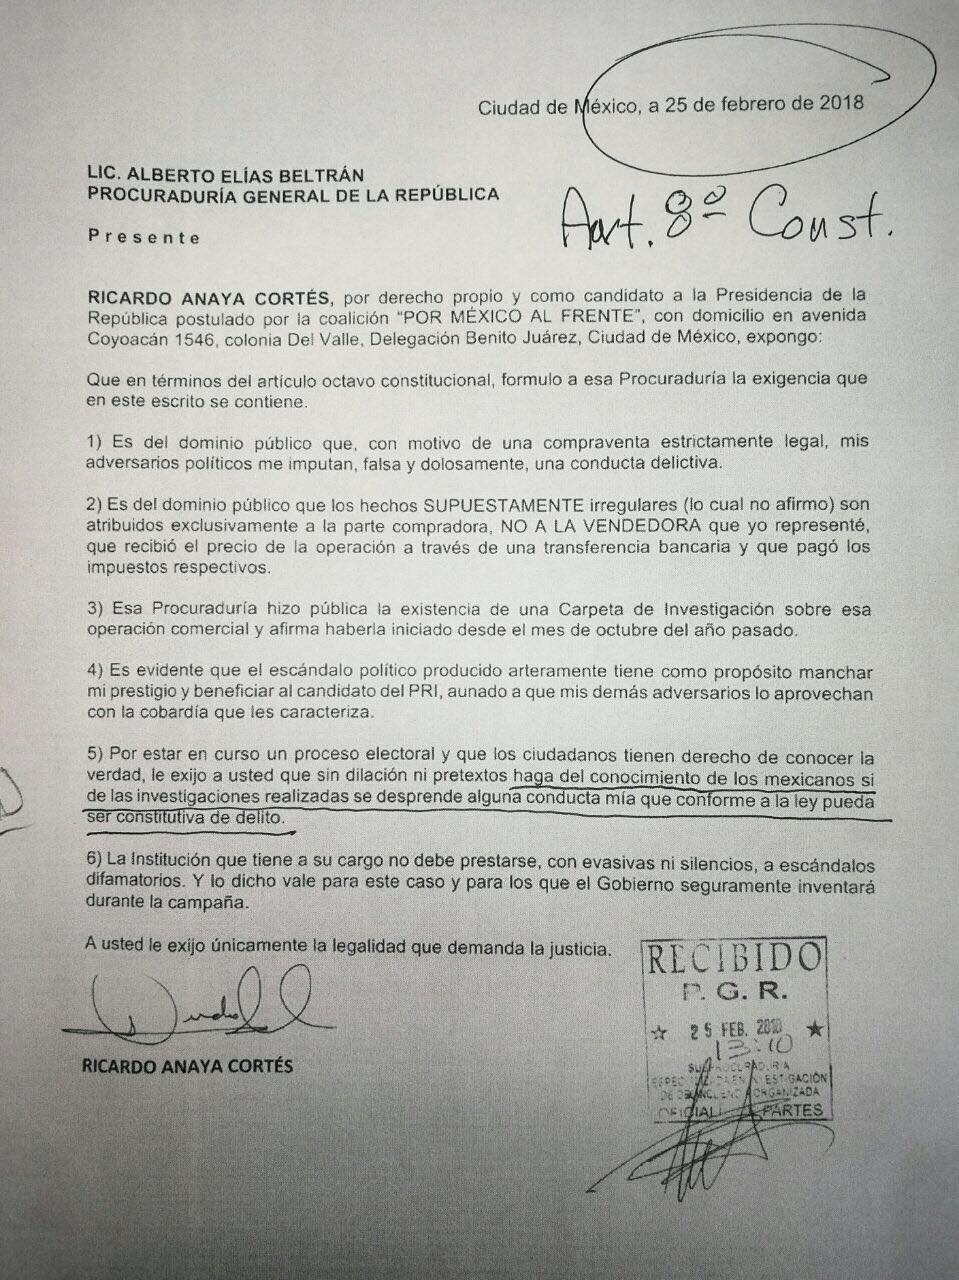 documentos-dante-delgado-caso-barreiro-despierta-loret-1